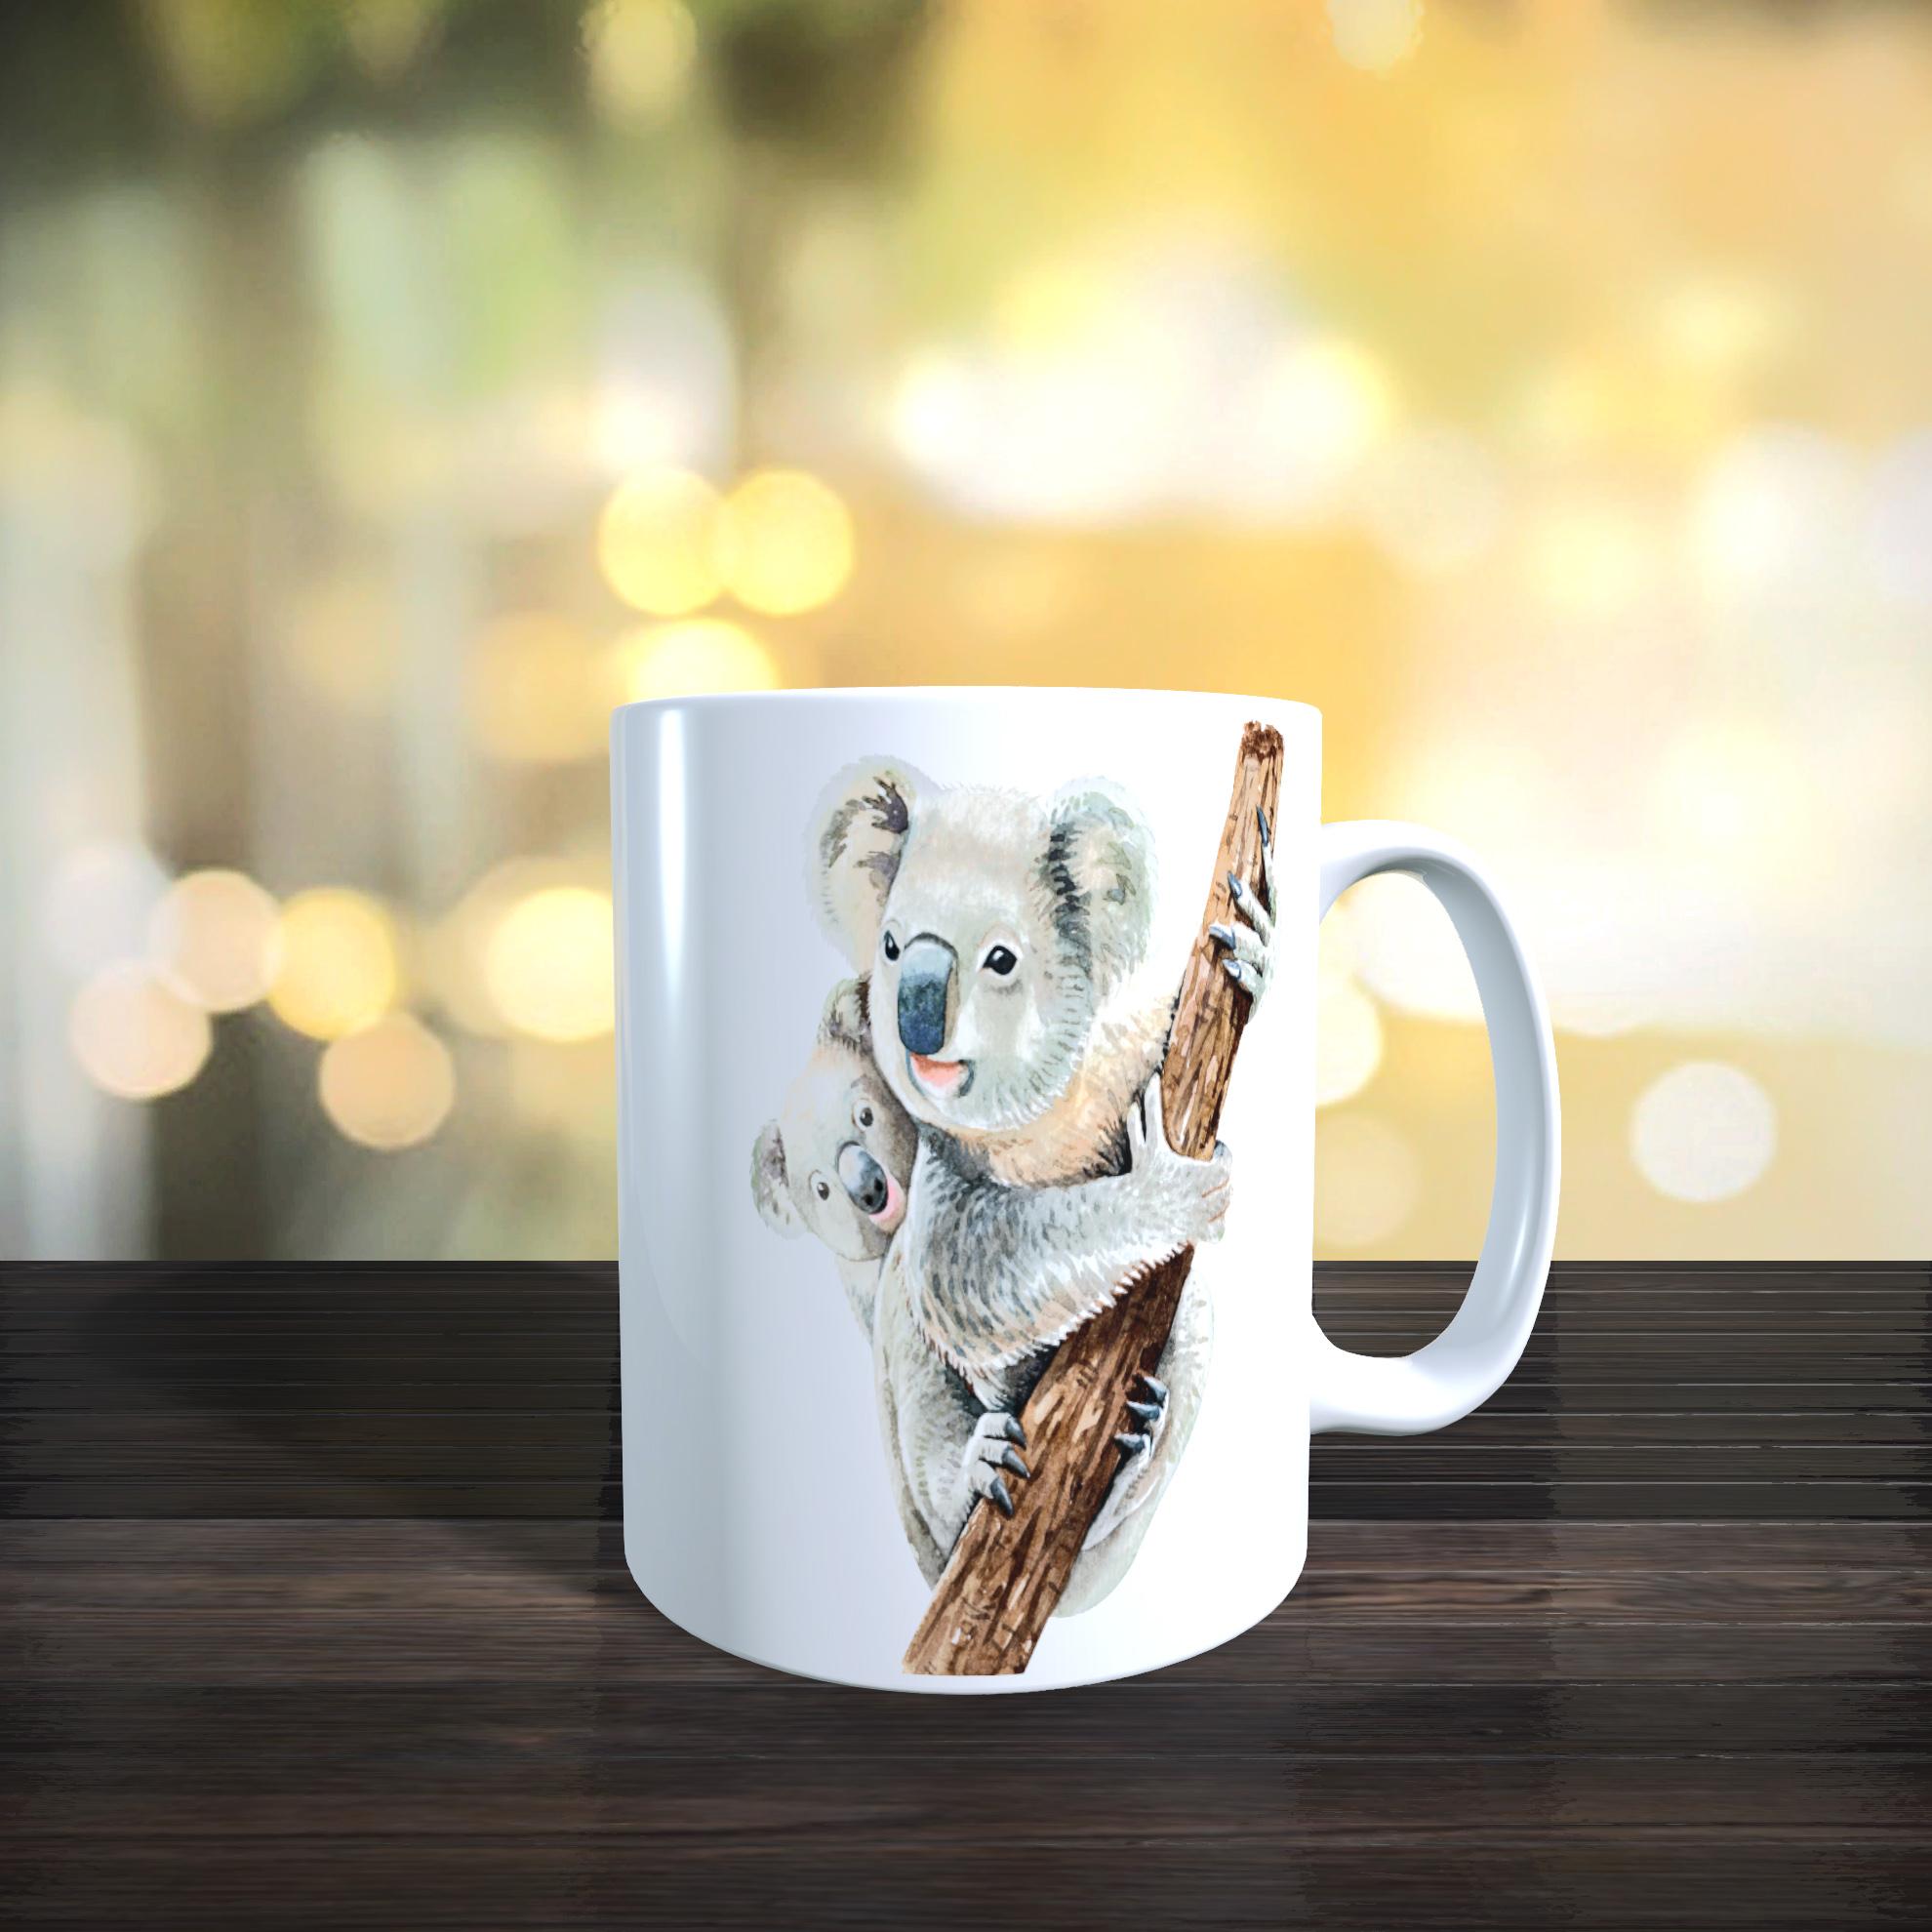 Cute Mother and Baby Koala 11oz Ceramic Mothers Day / Birthday Gift Mug.